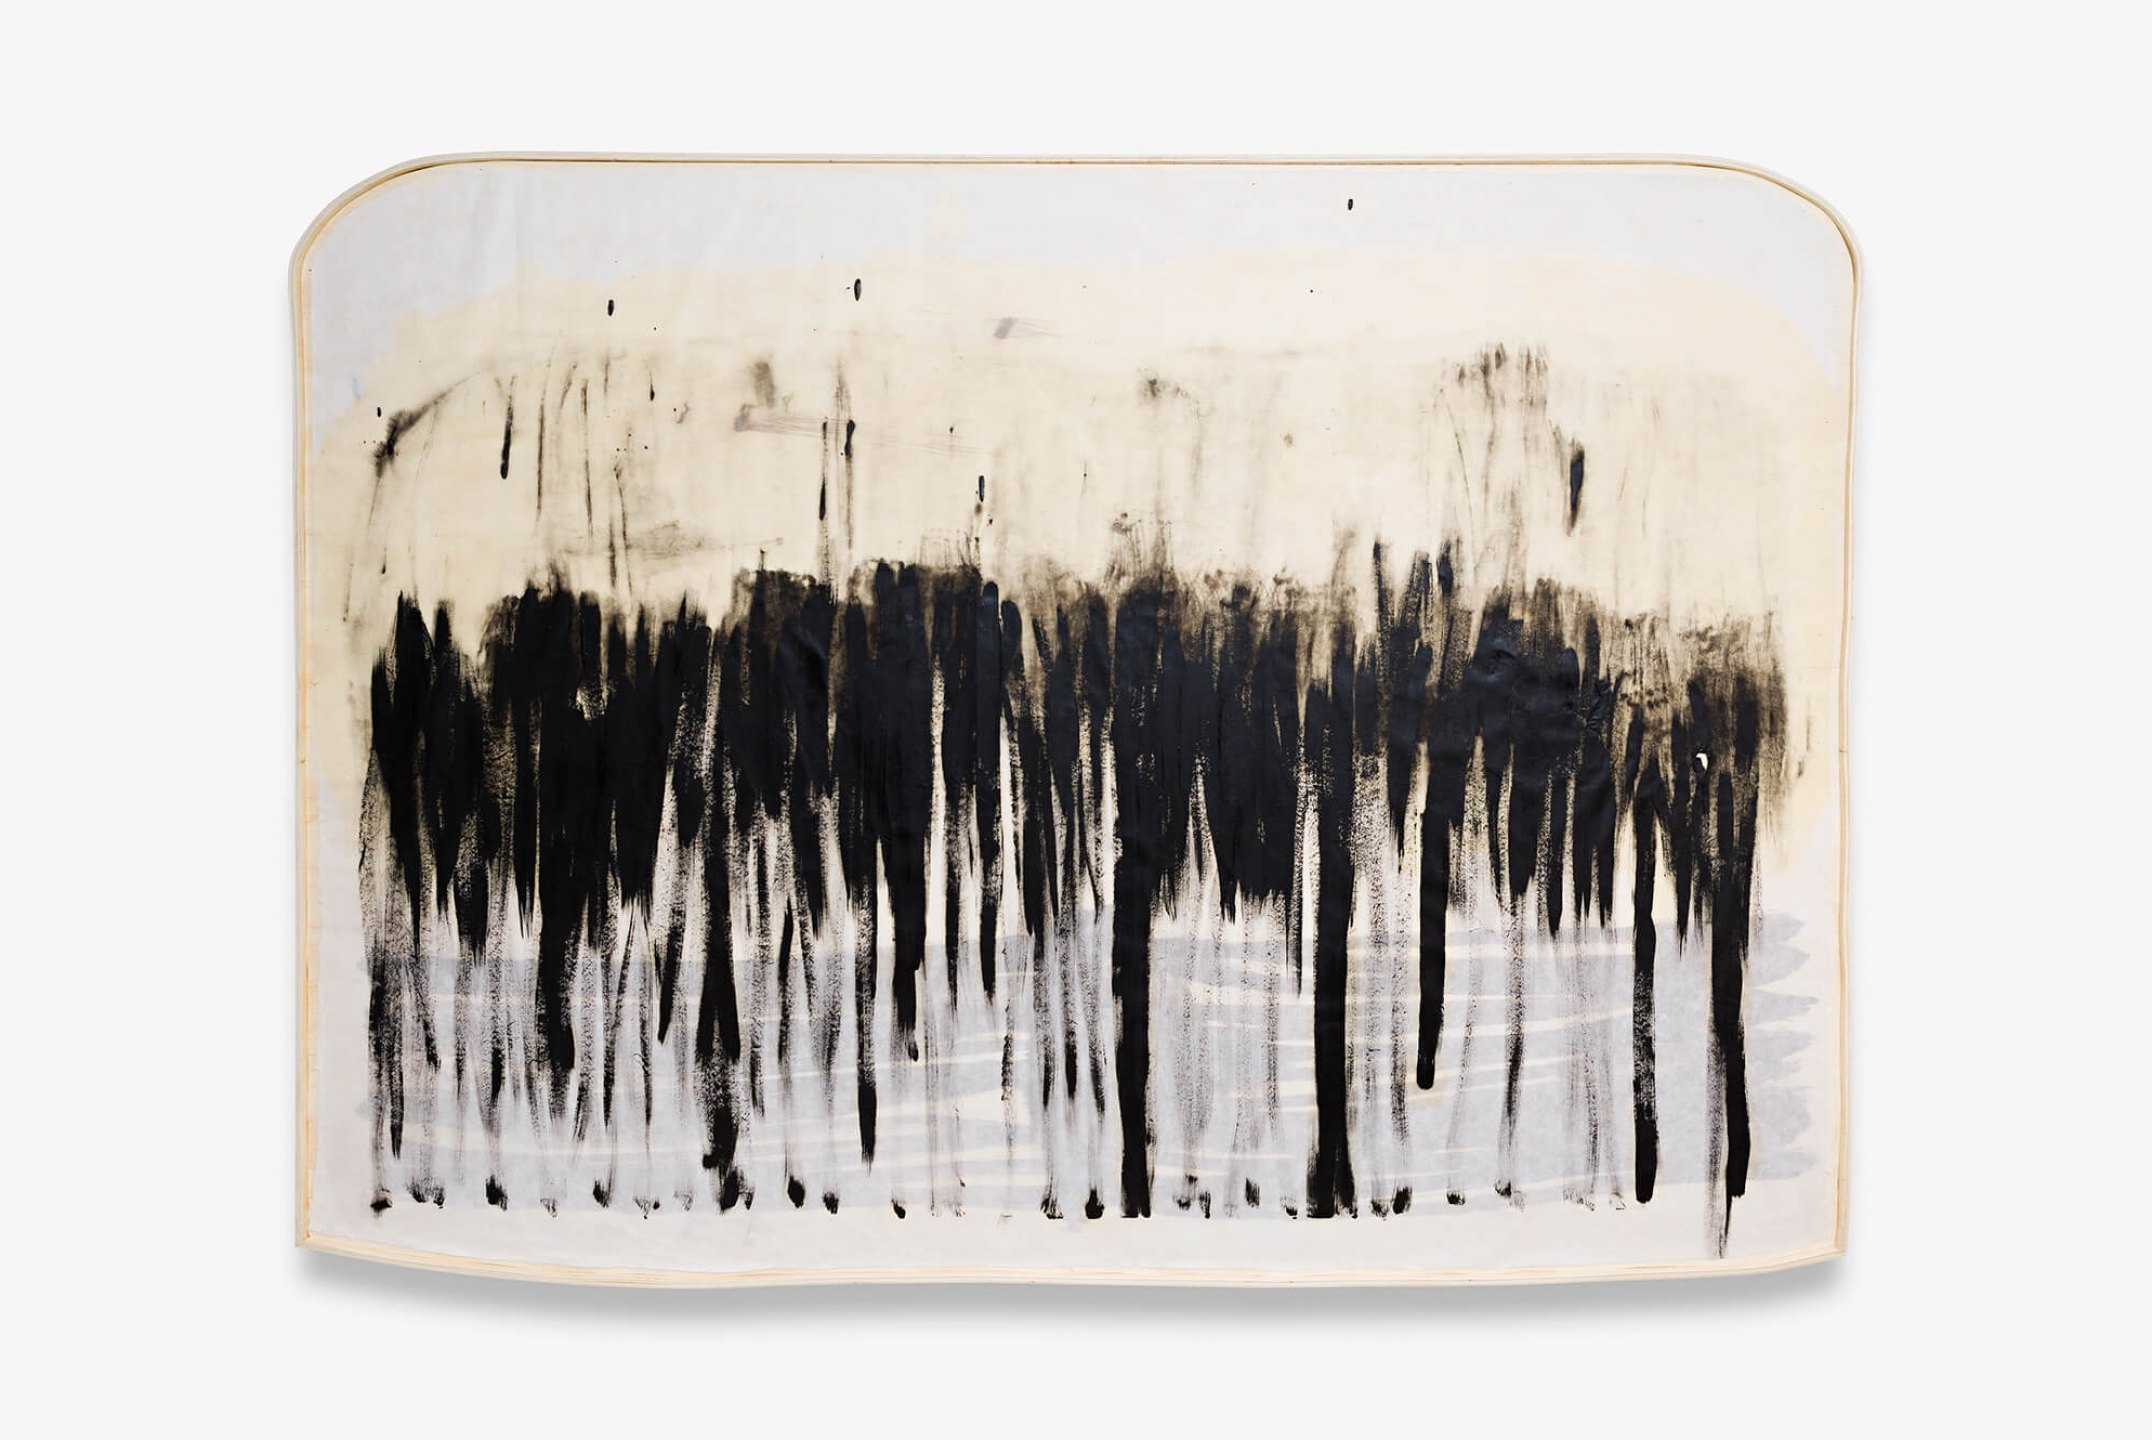 Marina Perez Simão, <em>Untitled,</em> 2014, oil on korean paper, &nbsp;141 × 188 × 4,5 cm&nbsp; - Mendes Wood DM